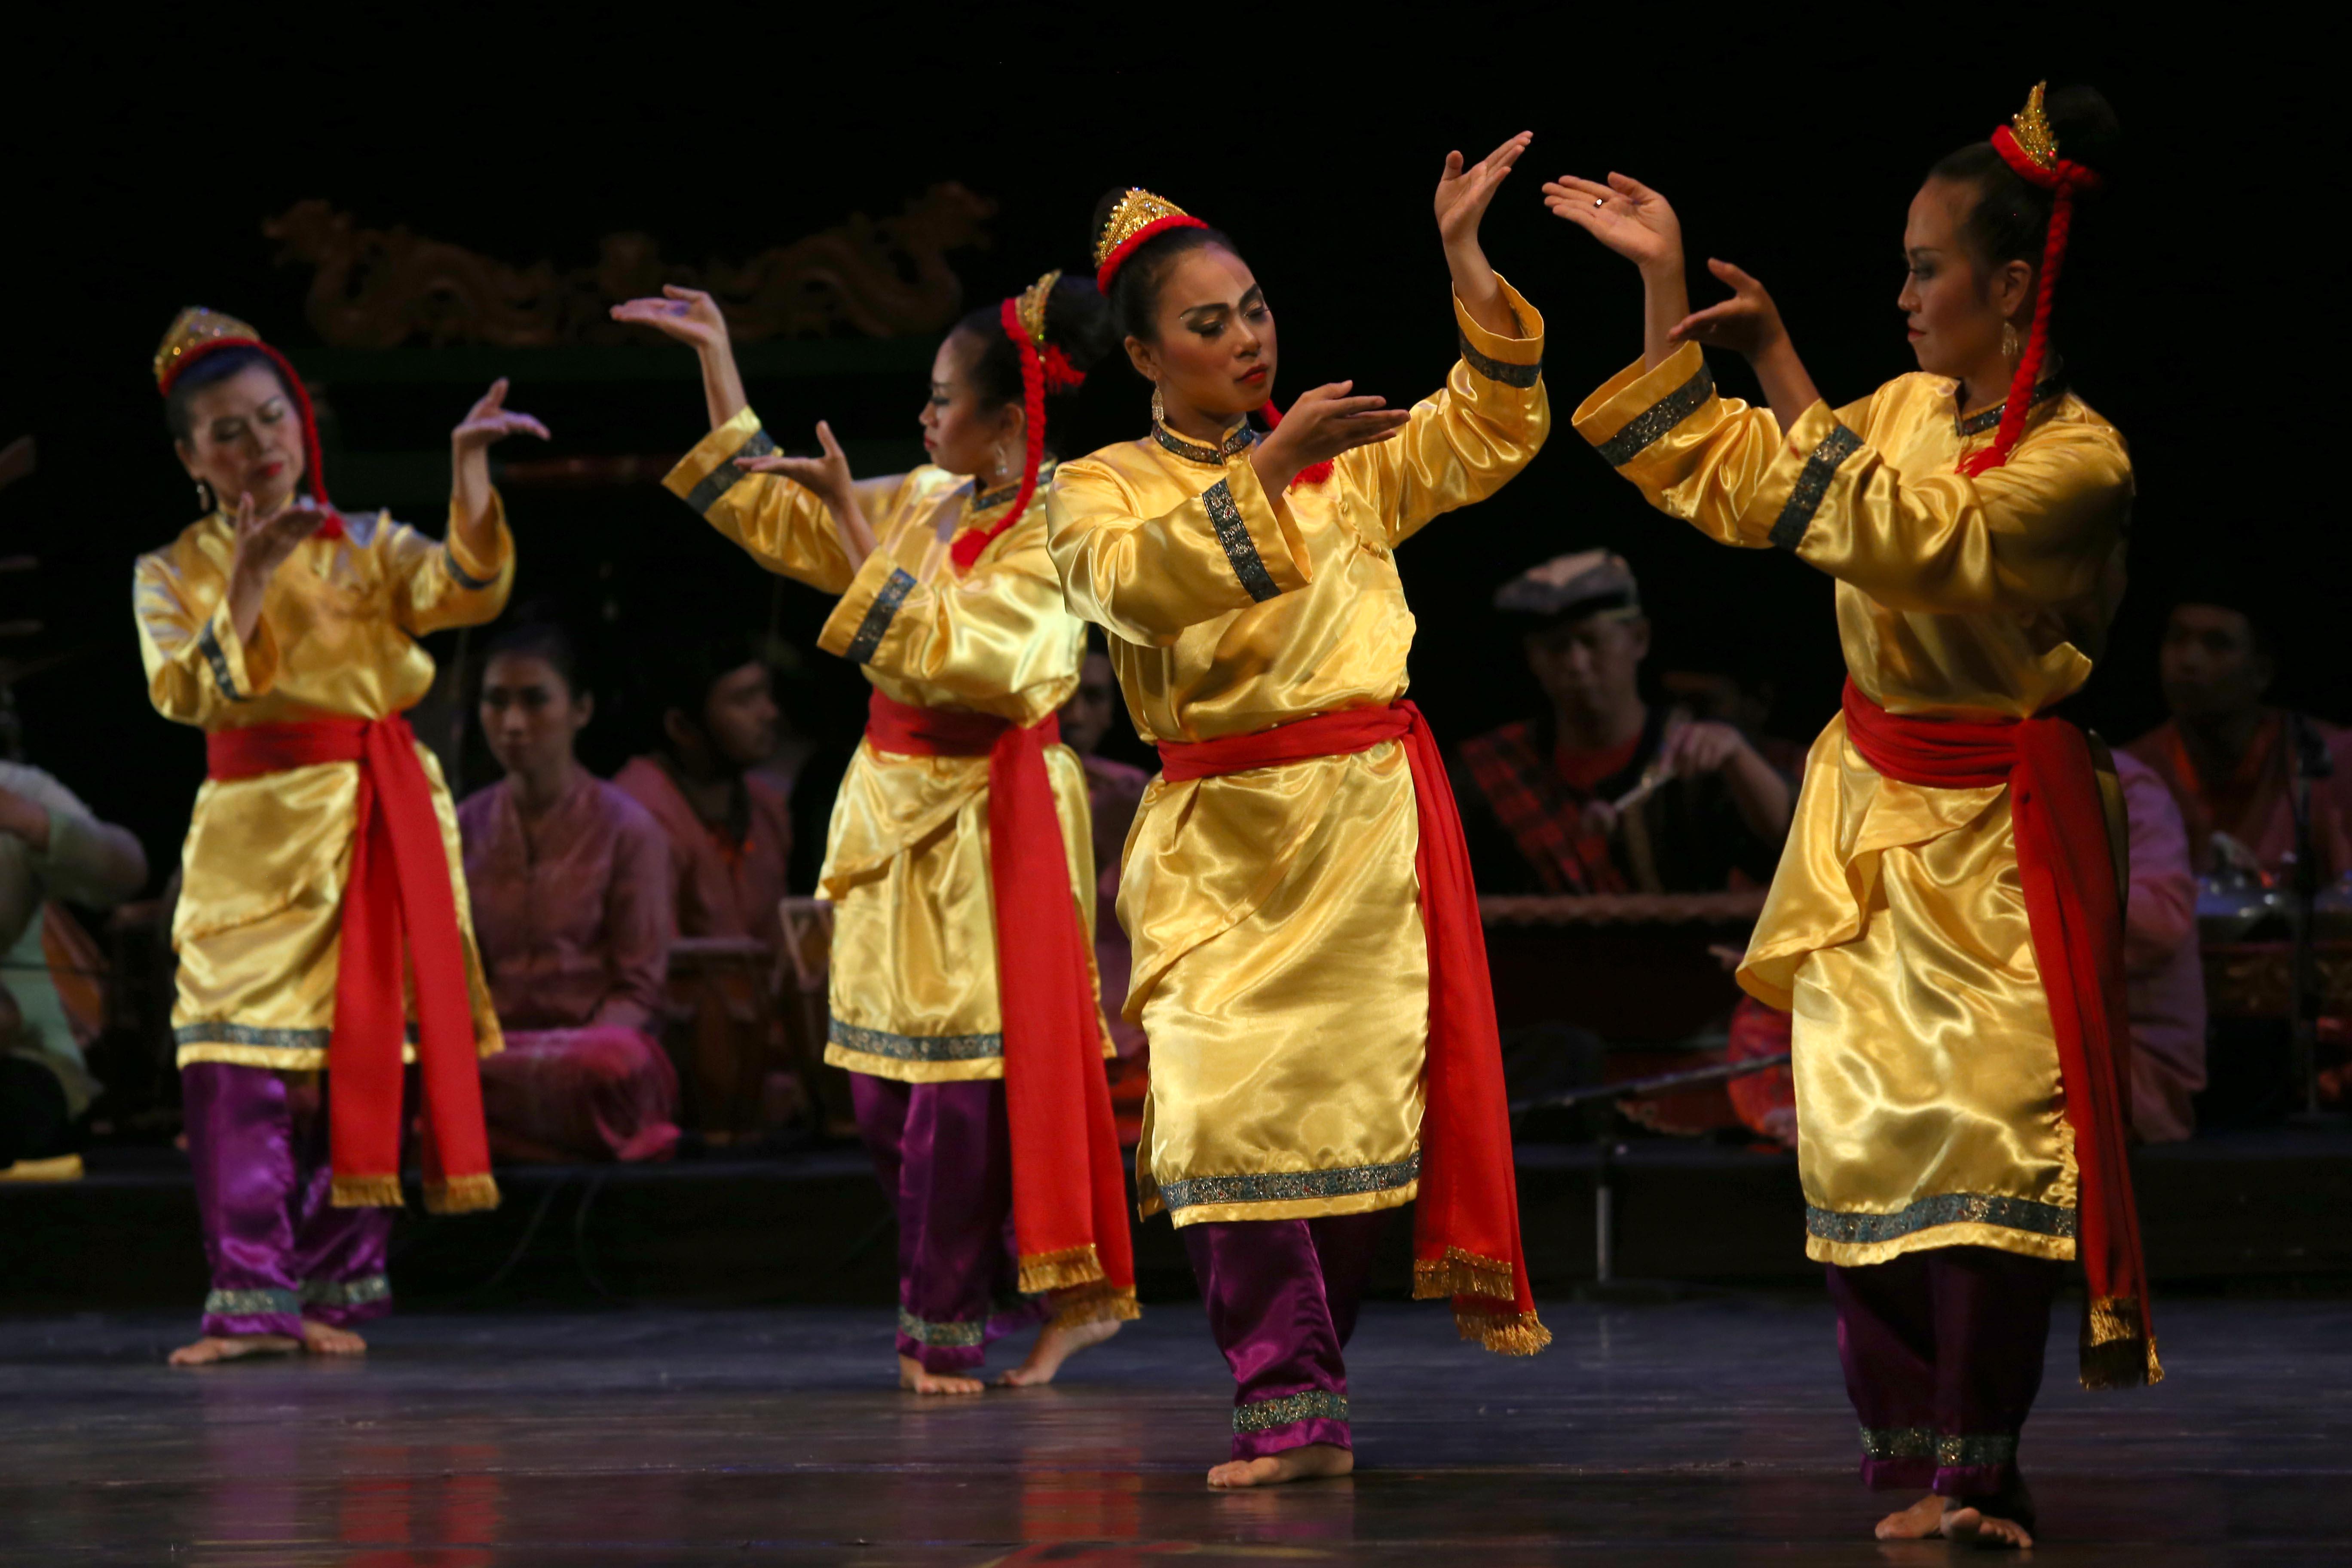 Sejumlah penari mementaskan tari tradisi Sipatmo dalam Telisik Tari DKJ Tari Betawi Topeng dan Cokek di Graha Budaya Jakarta, Taman Ismail Marzuki, Jakarta, Rabu (9/12).